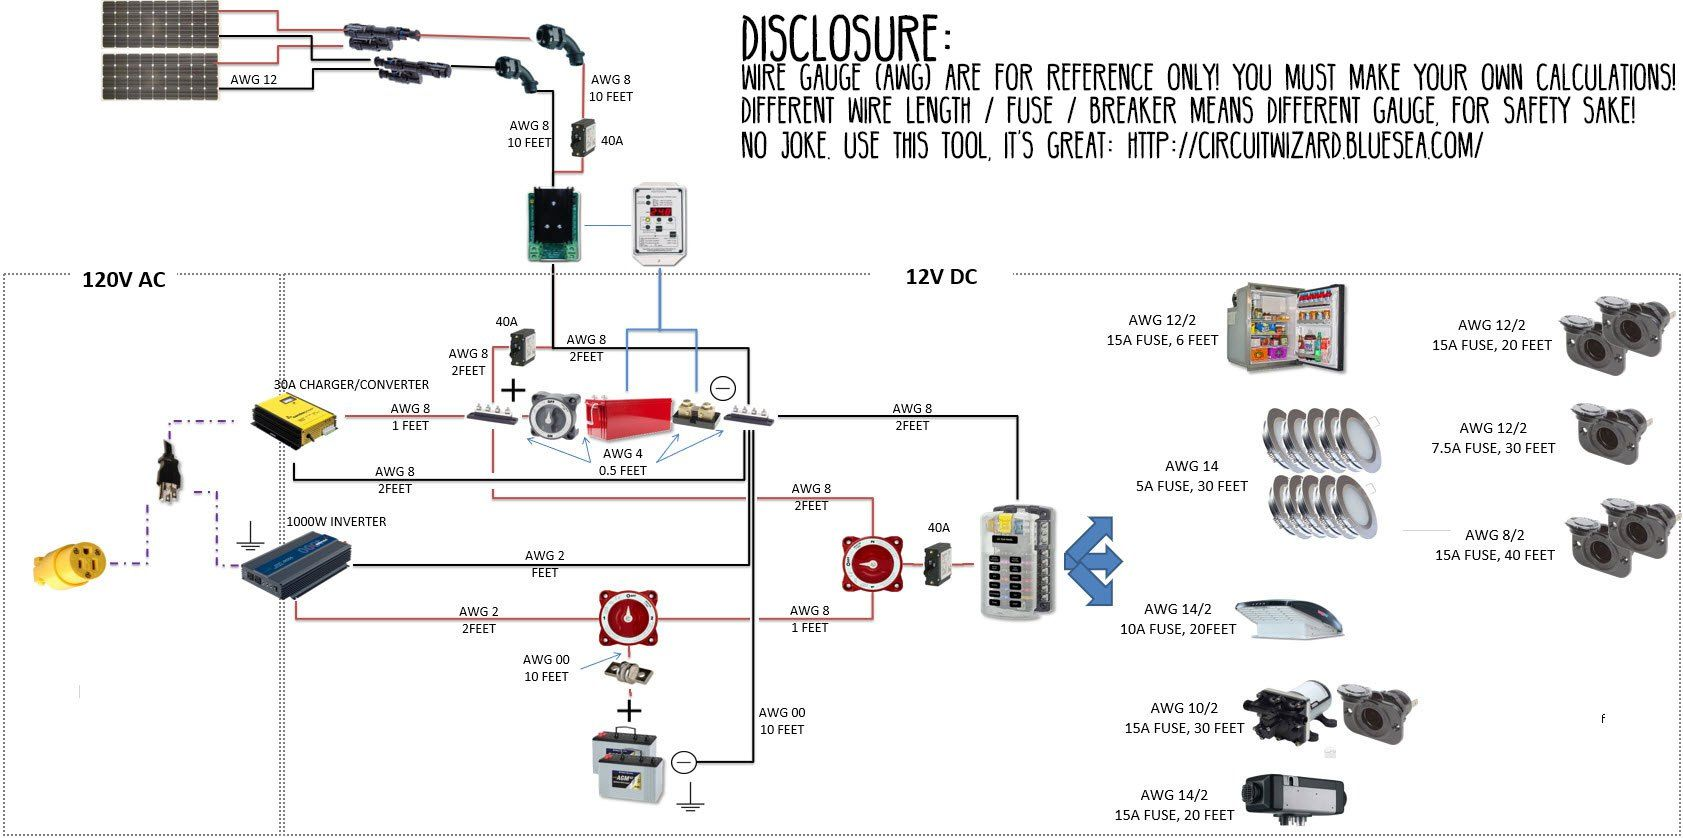 electrical diagram logical ford transit camper van v3 with disclosure  [ 1683 x 838 Pixel ]